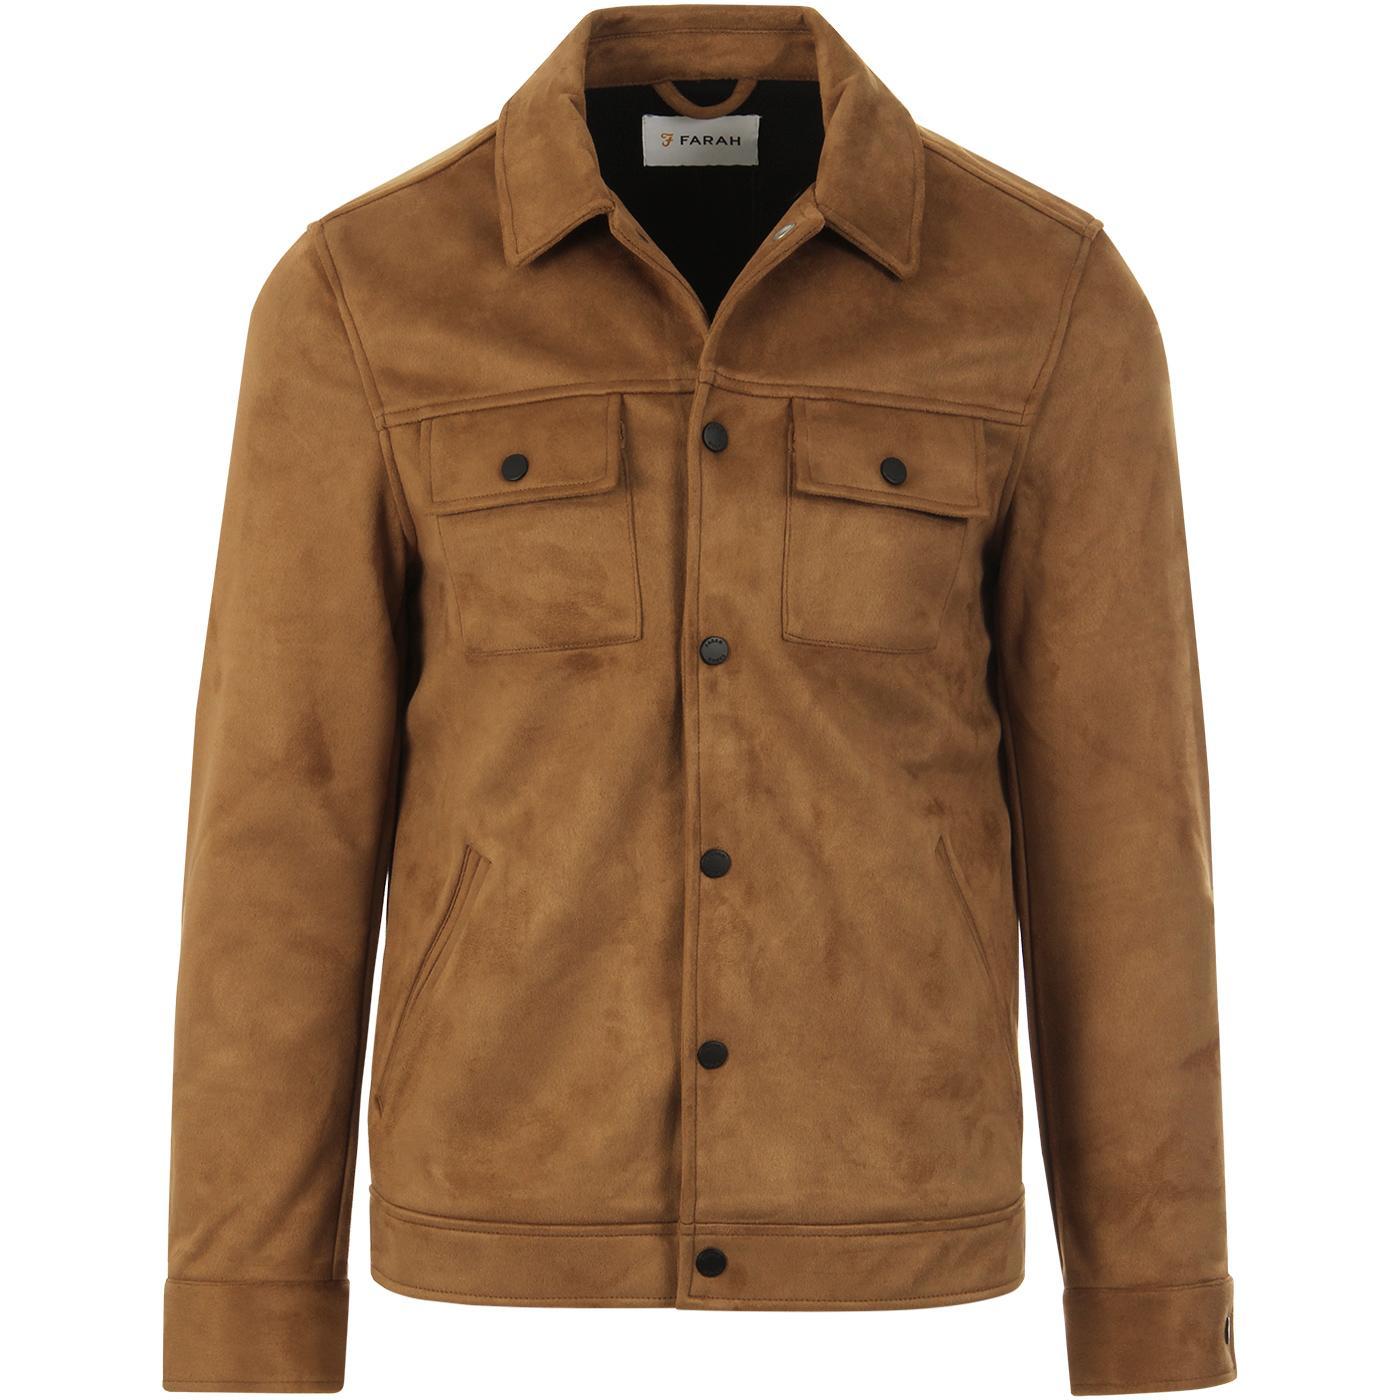 Cleethorpes FARAH VINTAGE Faux Suede Retro Jacket